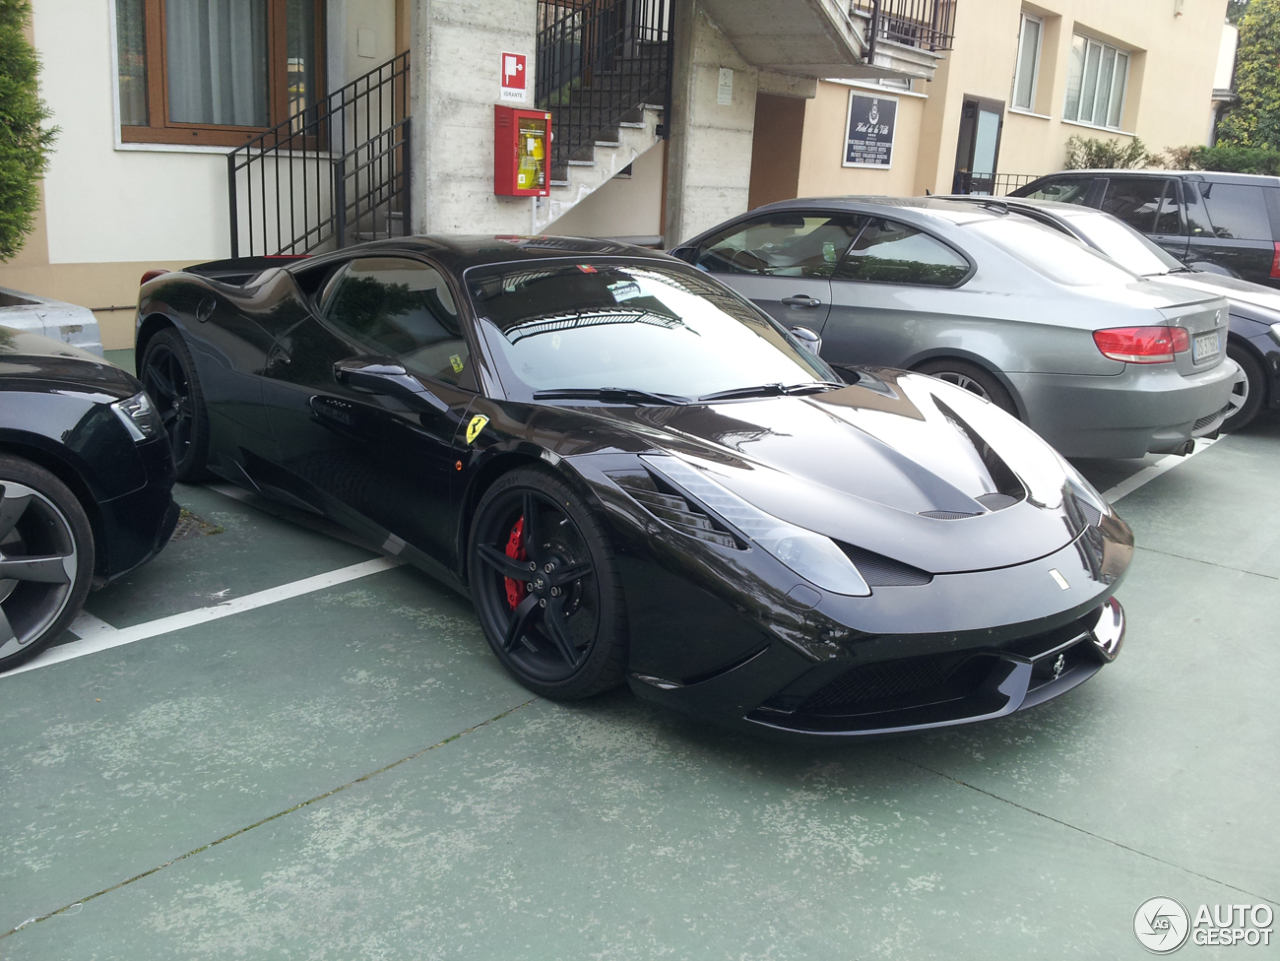 Ferrari 458 Speciale 27 April 2014 Autogespot